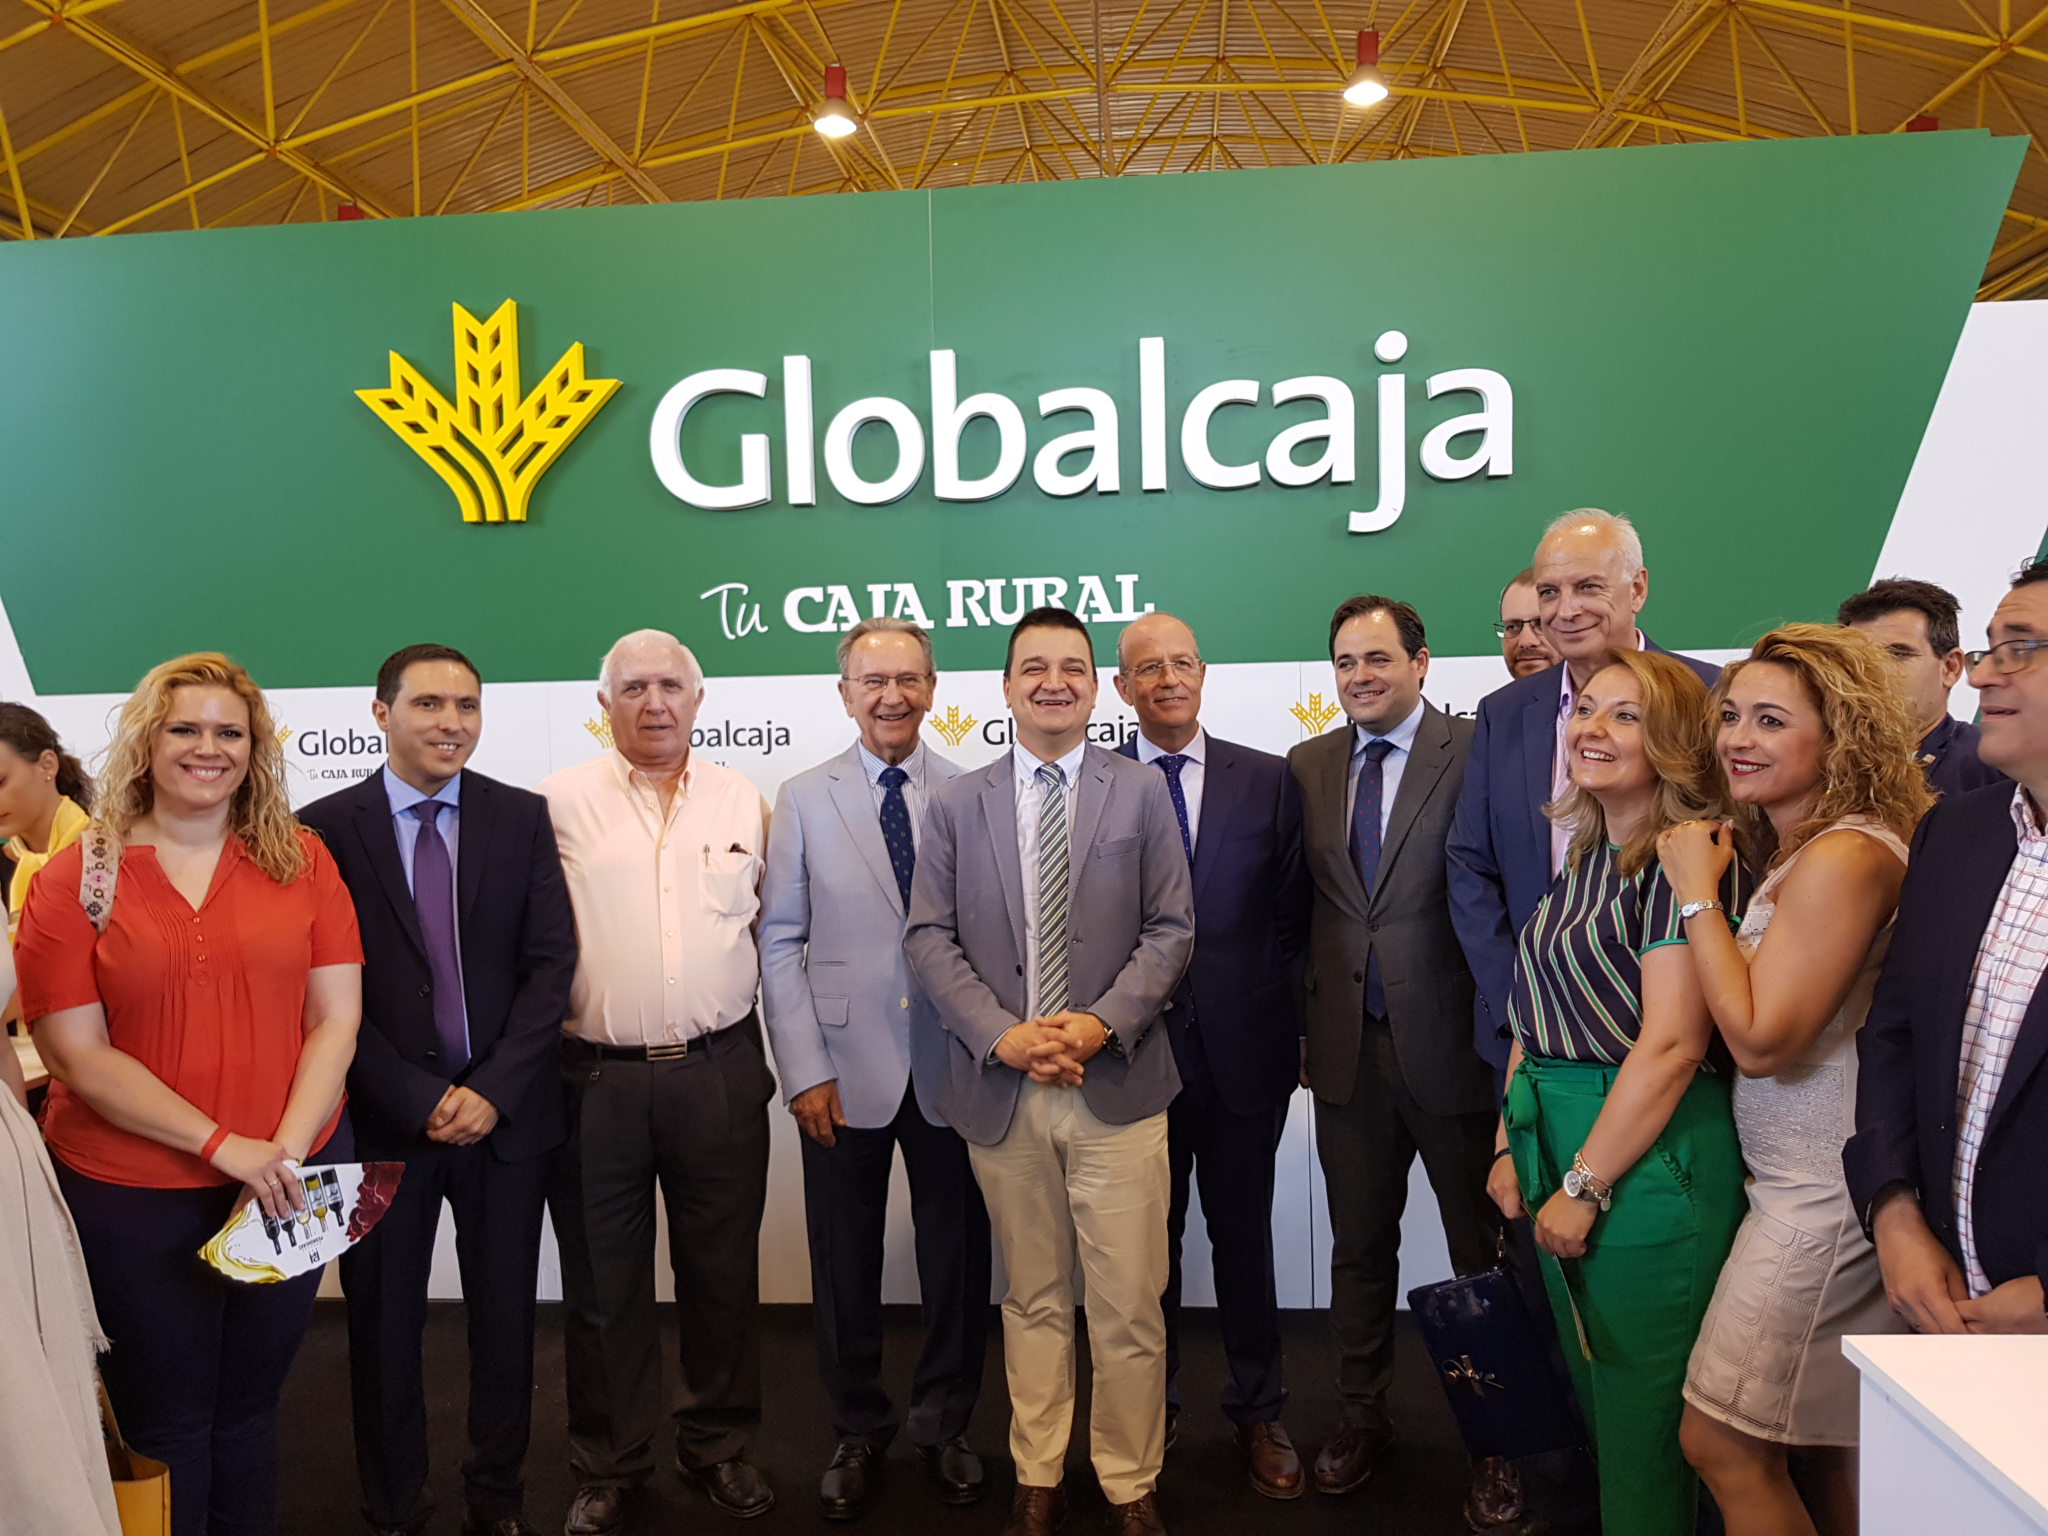 https://blog.globalcaja.es/wp-content/uploads/2019/07/Globalcaja-en-FIDA.jpeg